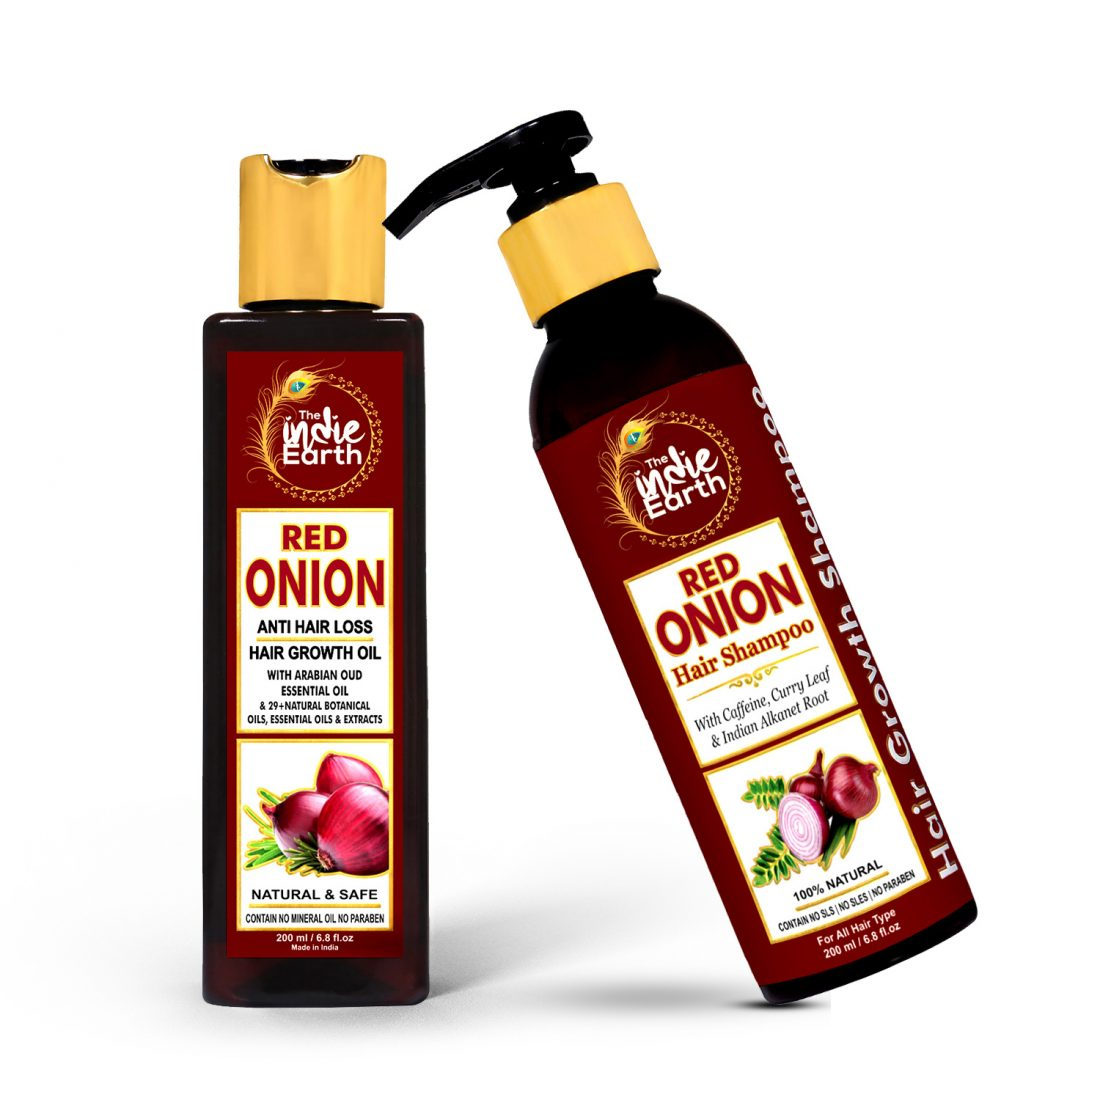 Red-Onion-Oil-&-Shampoo-2